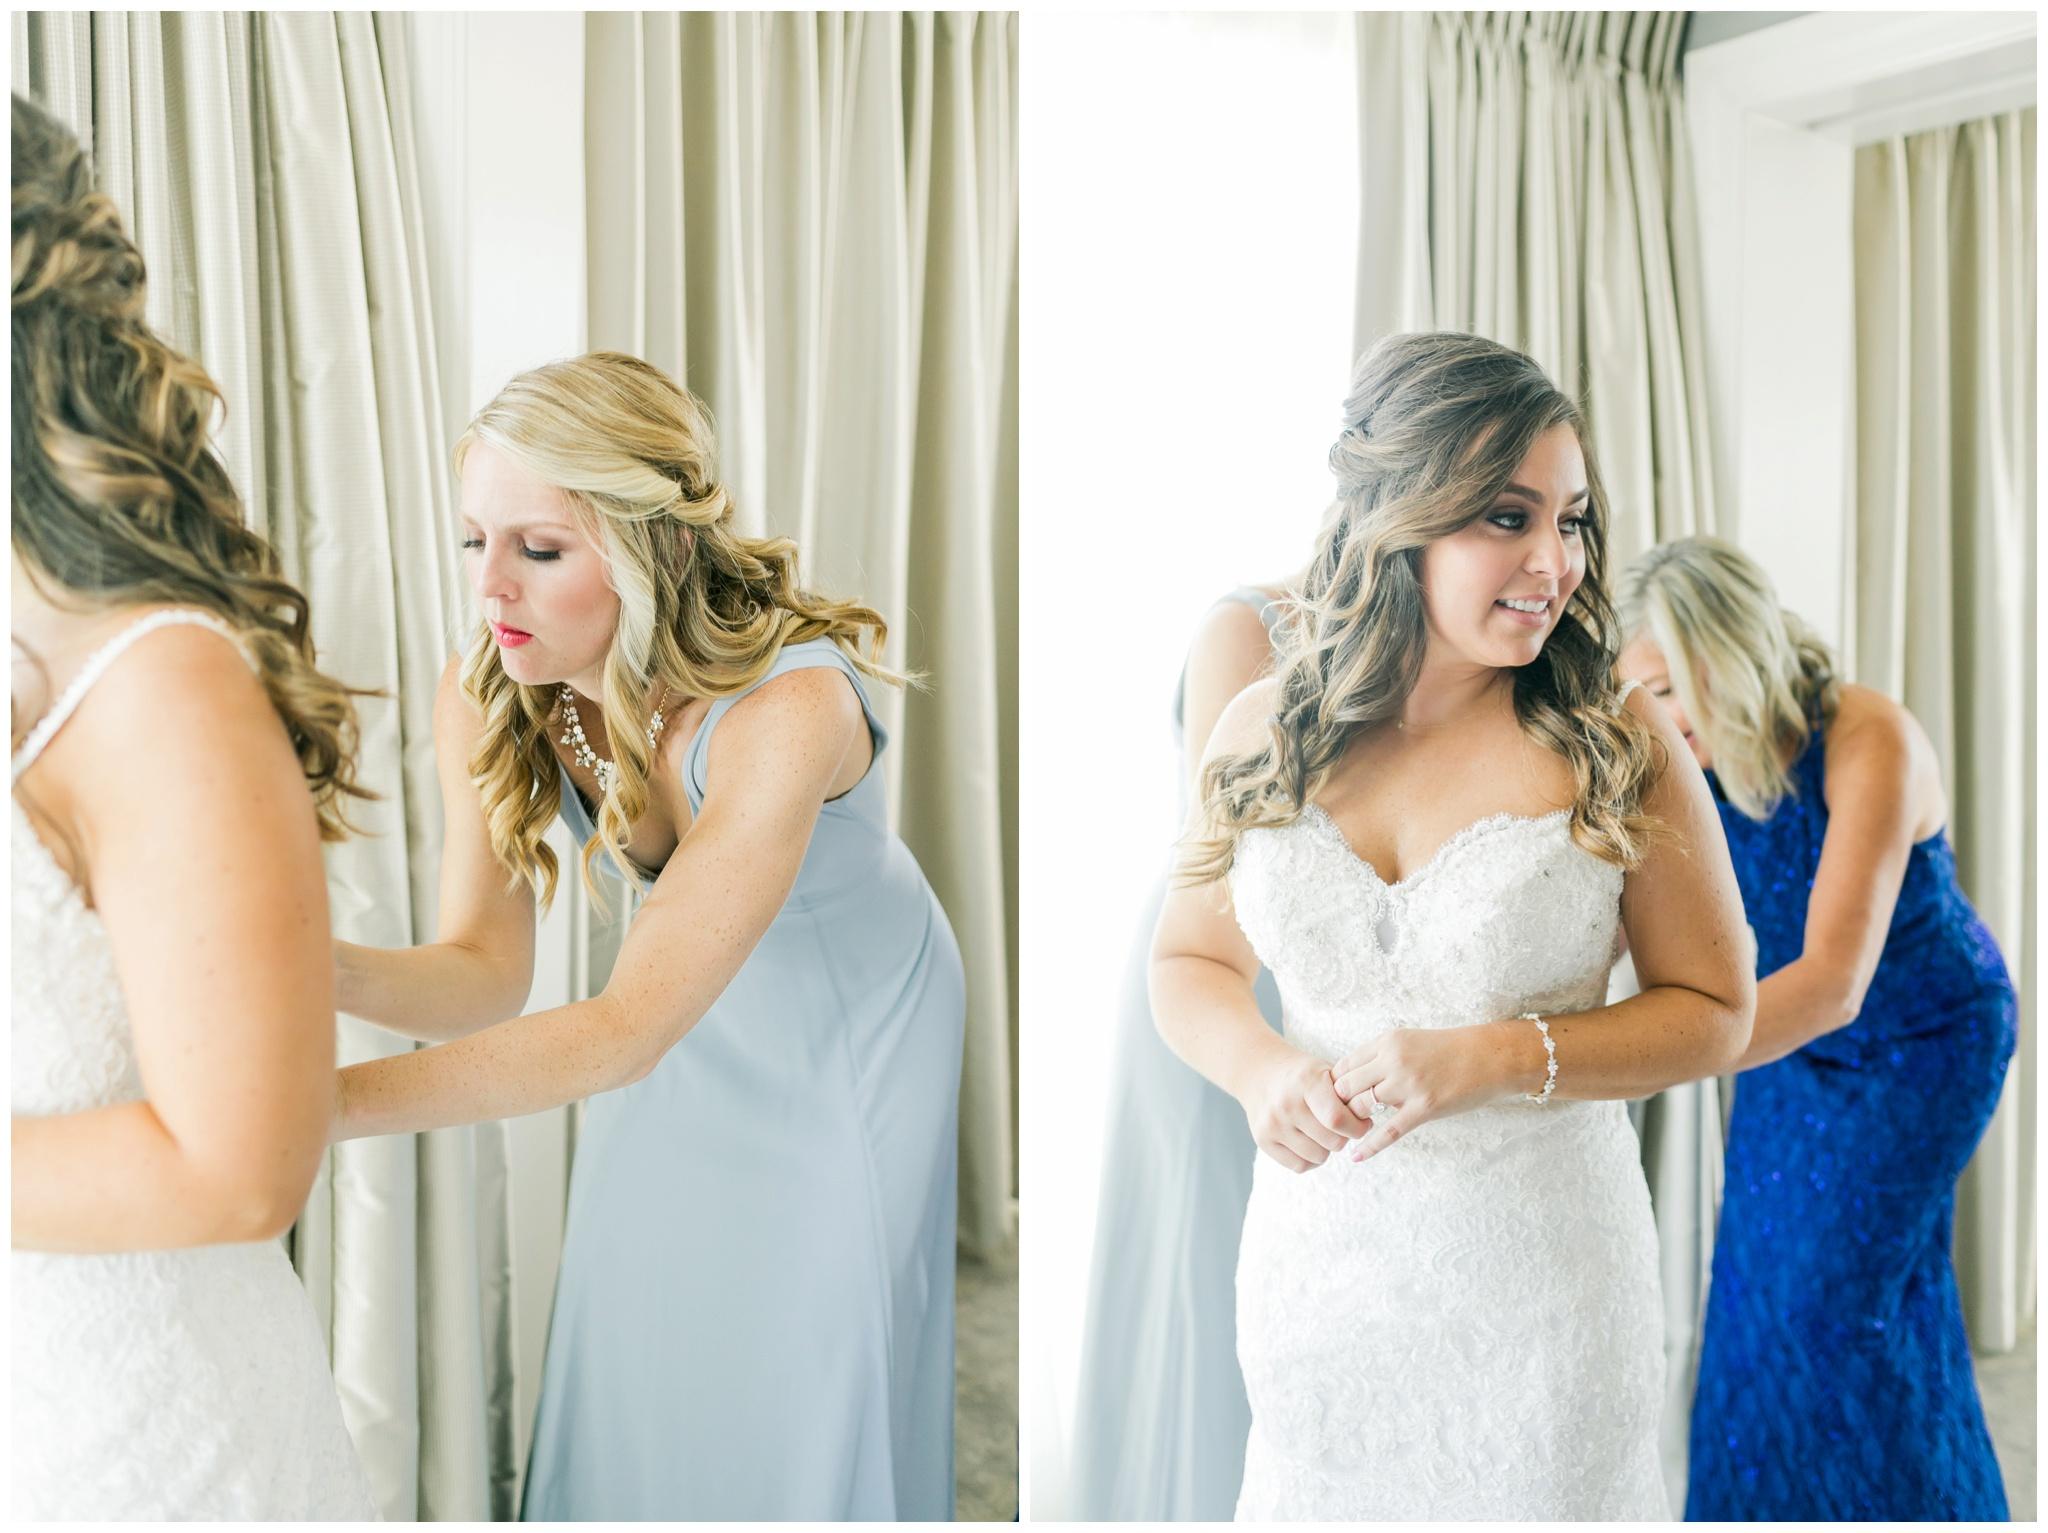 UW_Memorial_Union_wedding_madison_wisconsin_wedding_photographers_4584.jpg